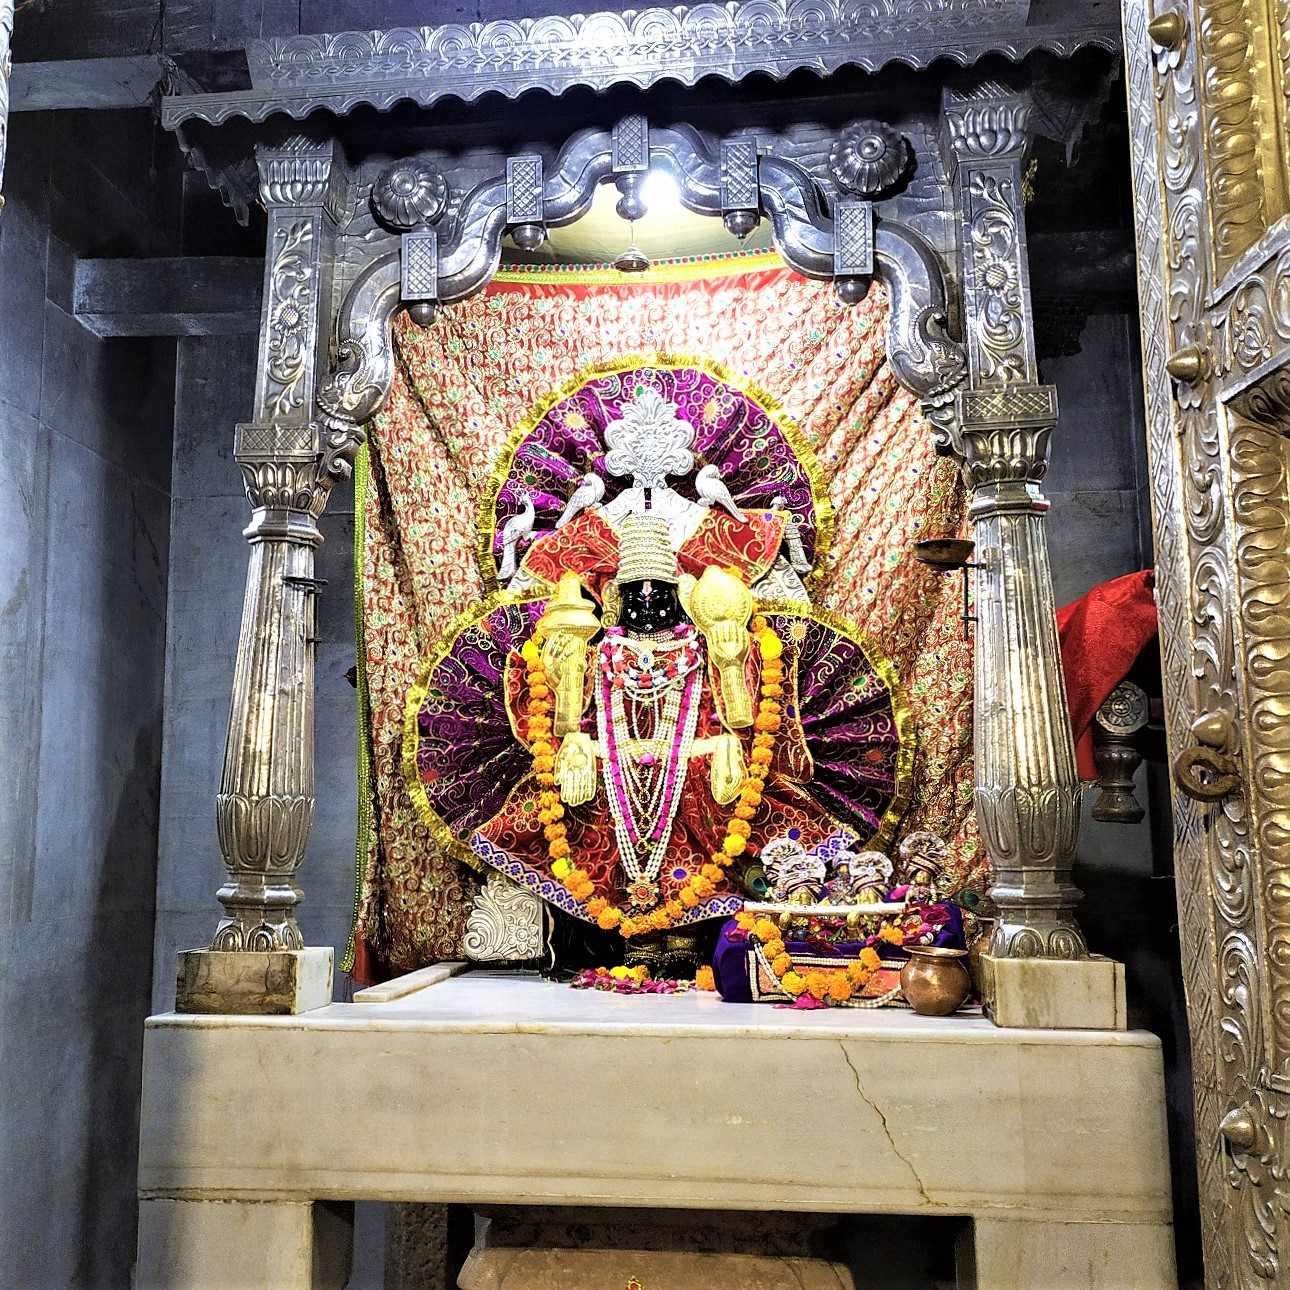 Trivikramrai ji Idol in Temple at Narayan Sarovar